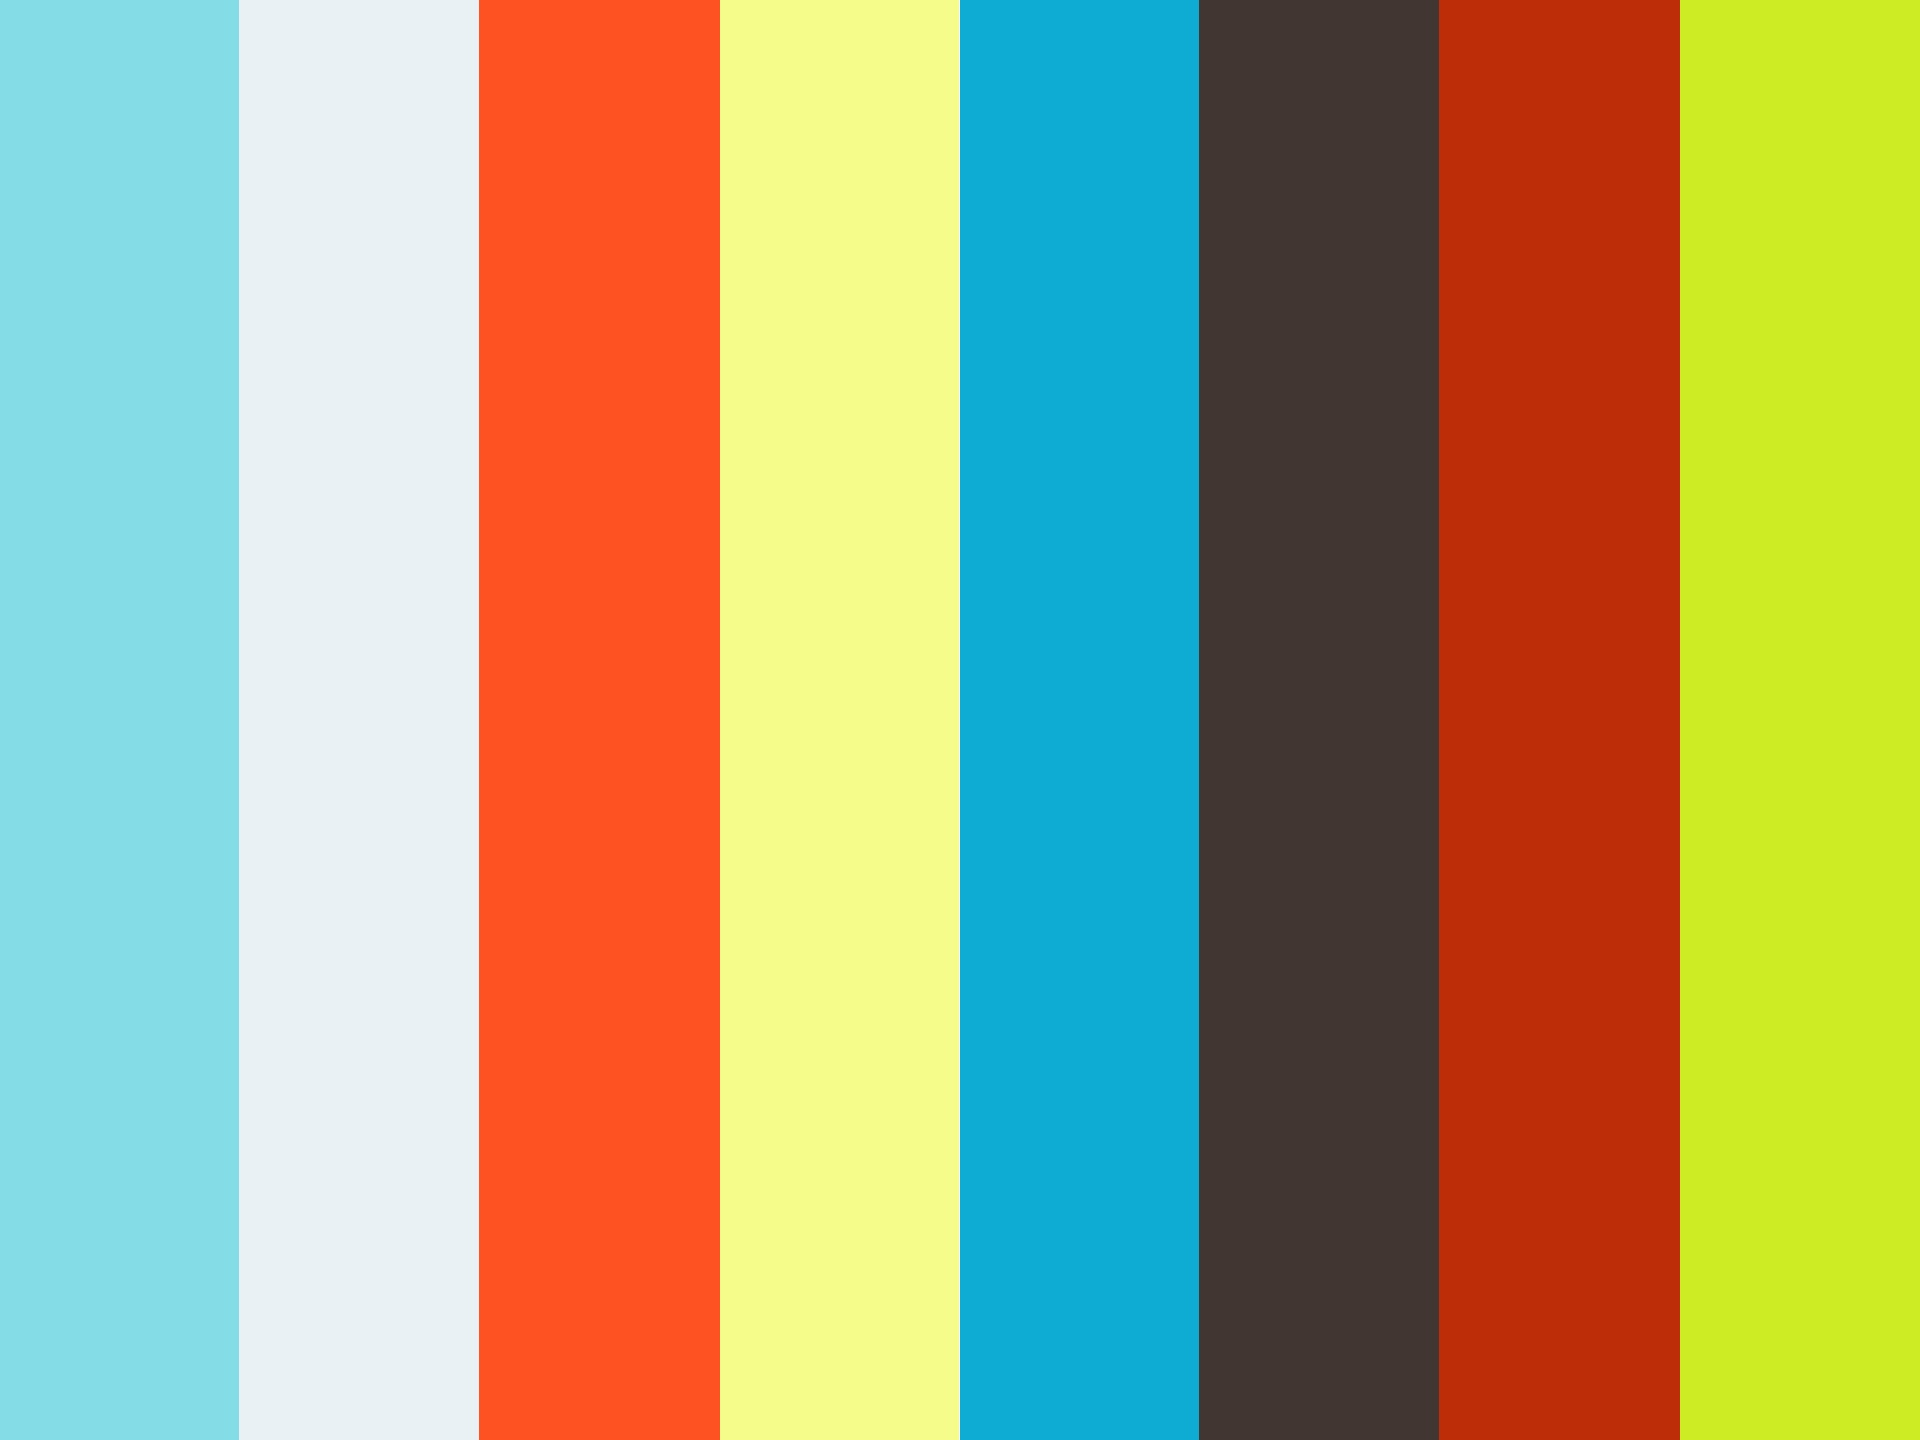 Brightsrl Video Emozionali - Video MEC3 on Vimeo